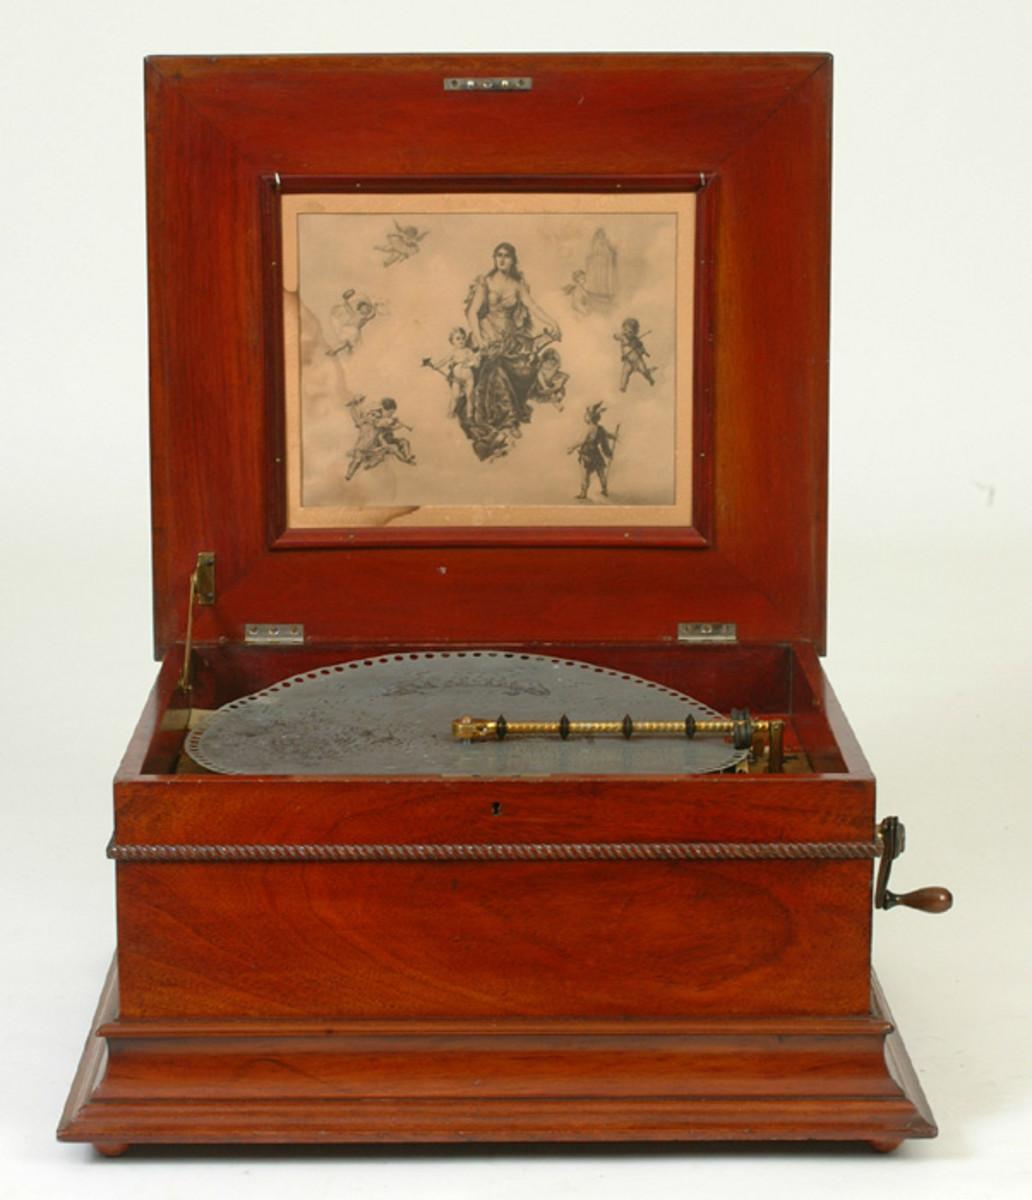 My lovely Regina music box.